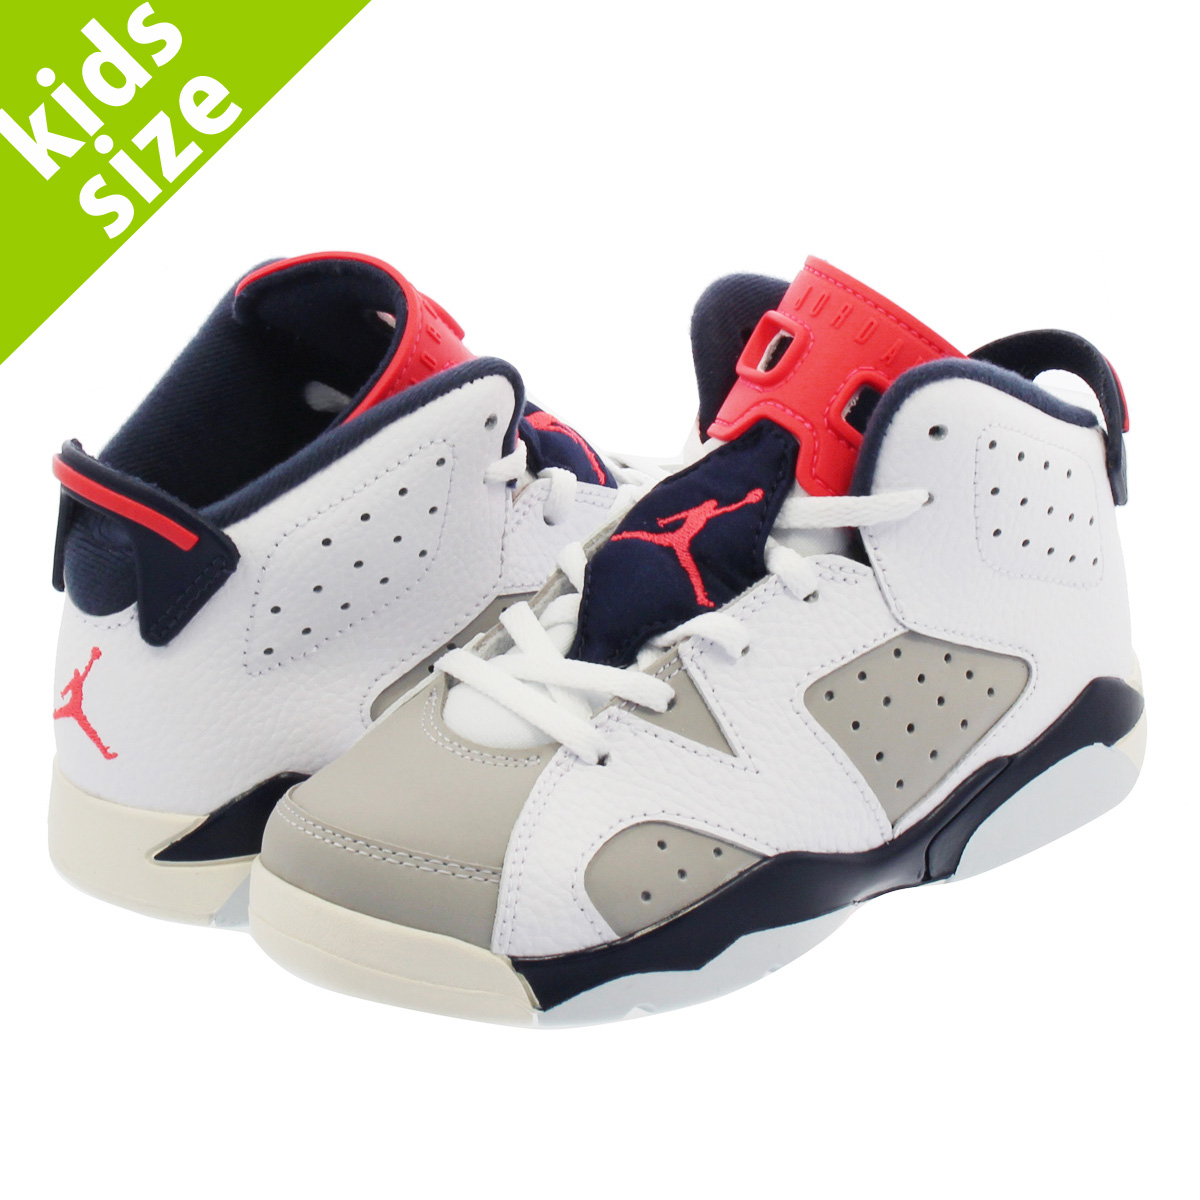 df3c7623f70 NIKE AIR JORDAN 6 RETRO BP Nike Air Jordan 6 nostalgic BP WHITE/INFRARED 23  ...